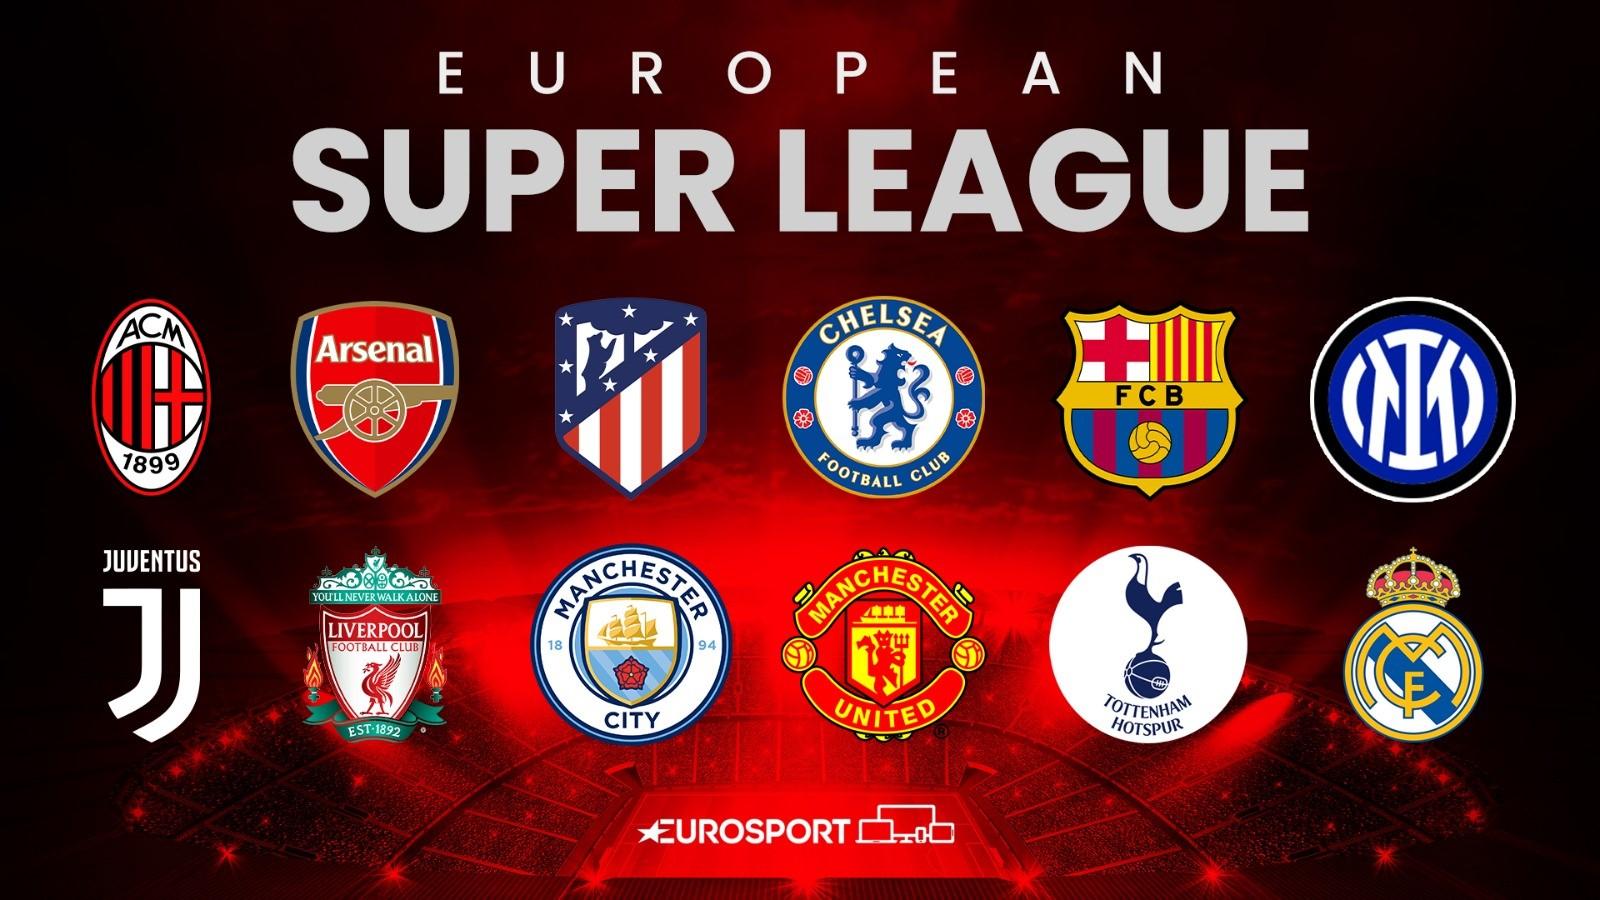 https://i.eurosport.com/2021/04/19/3117276.jpg